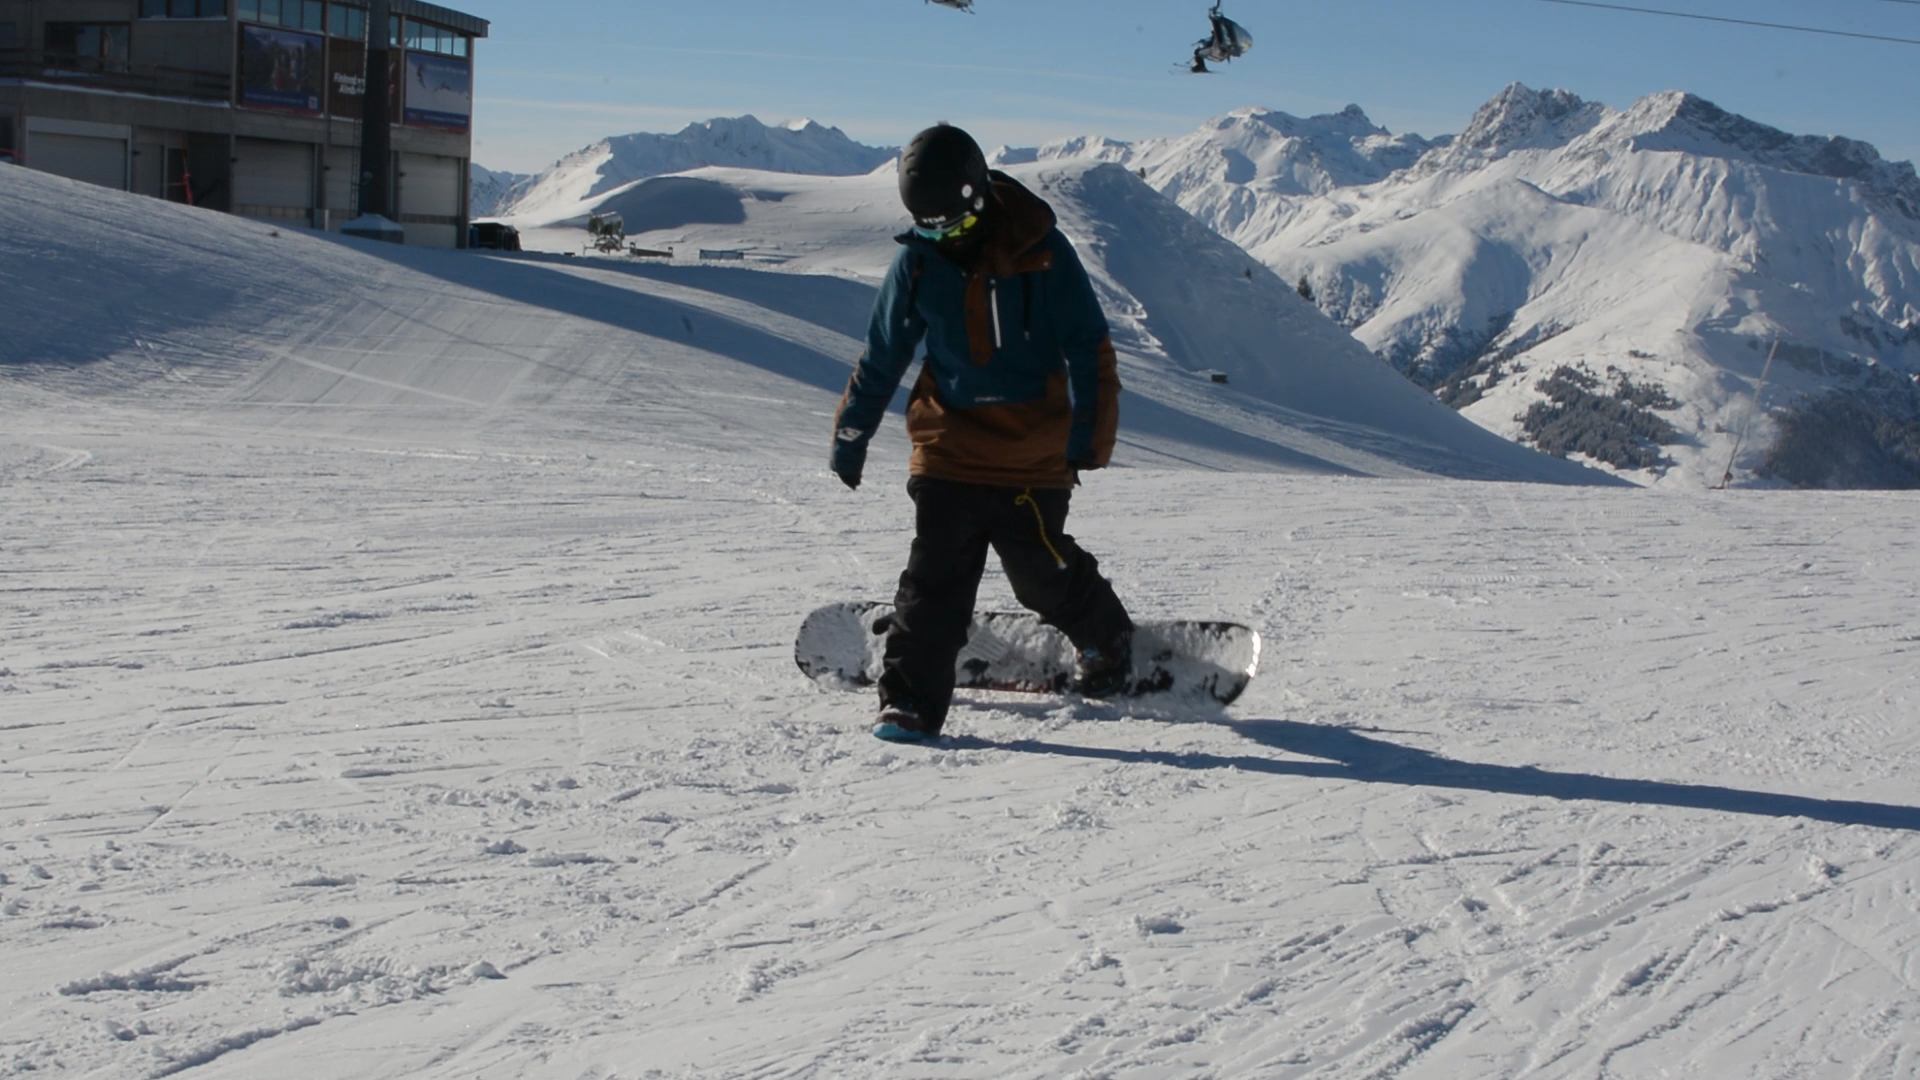 climbing on a snowboard